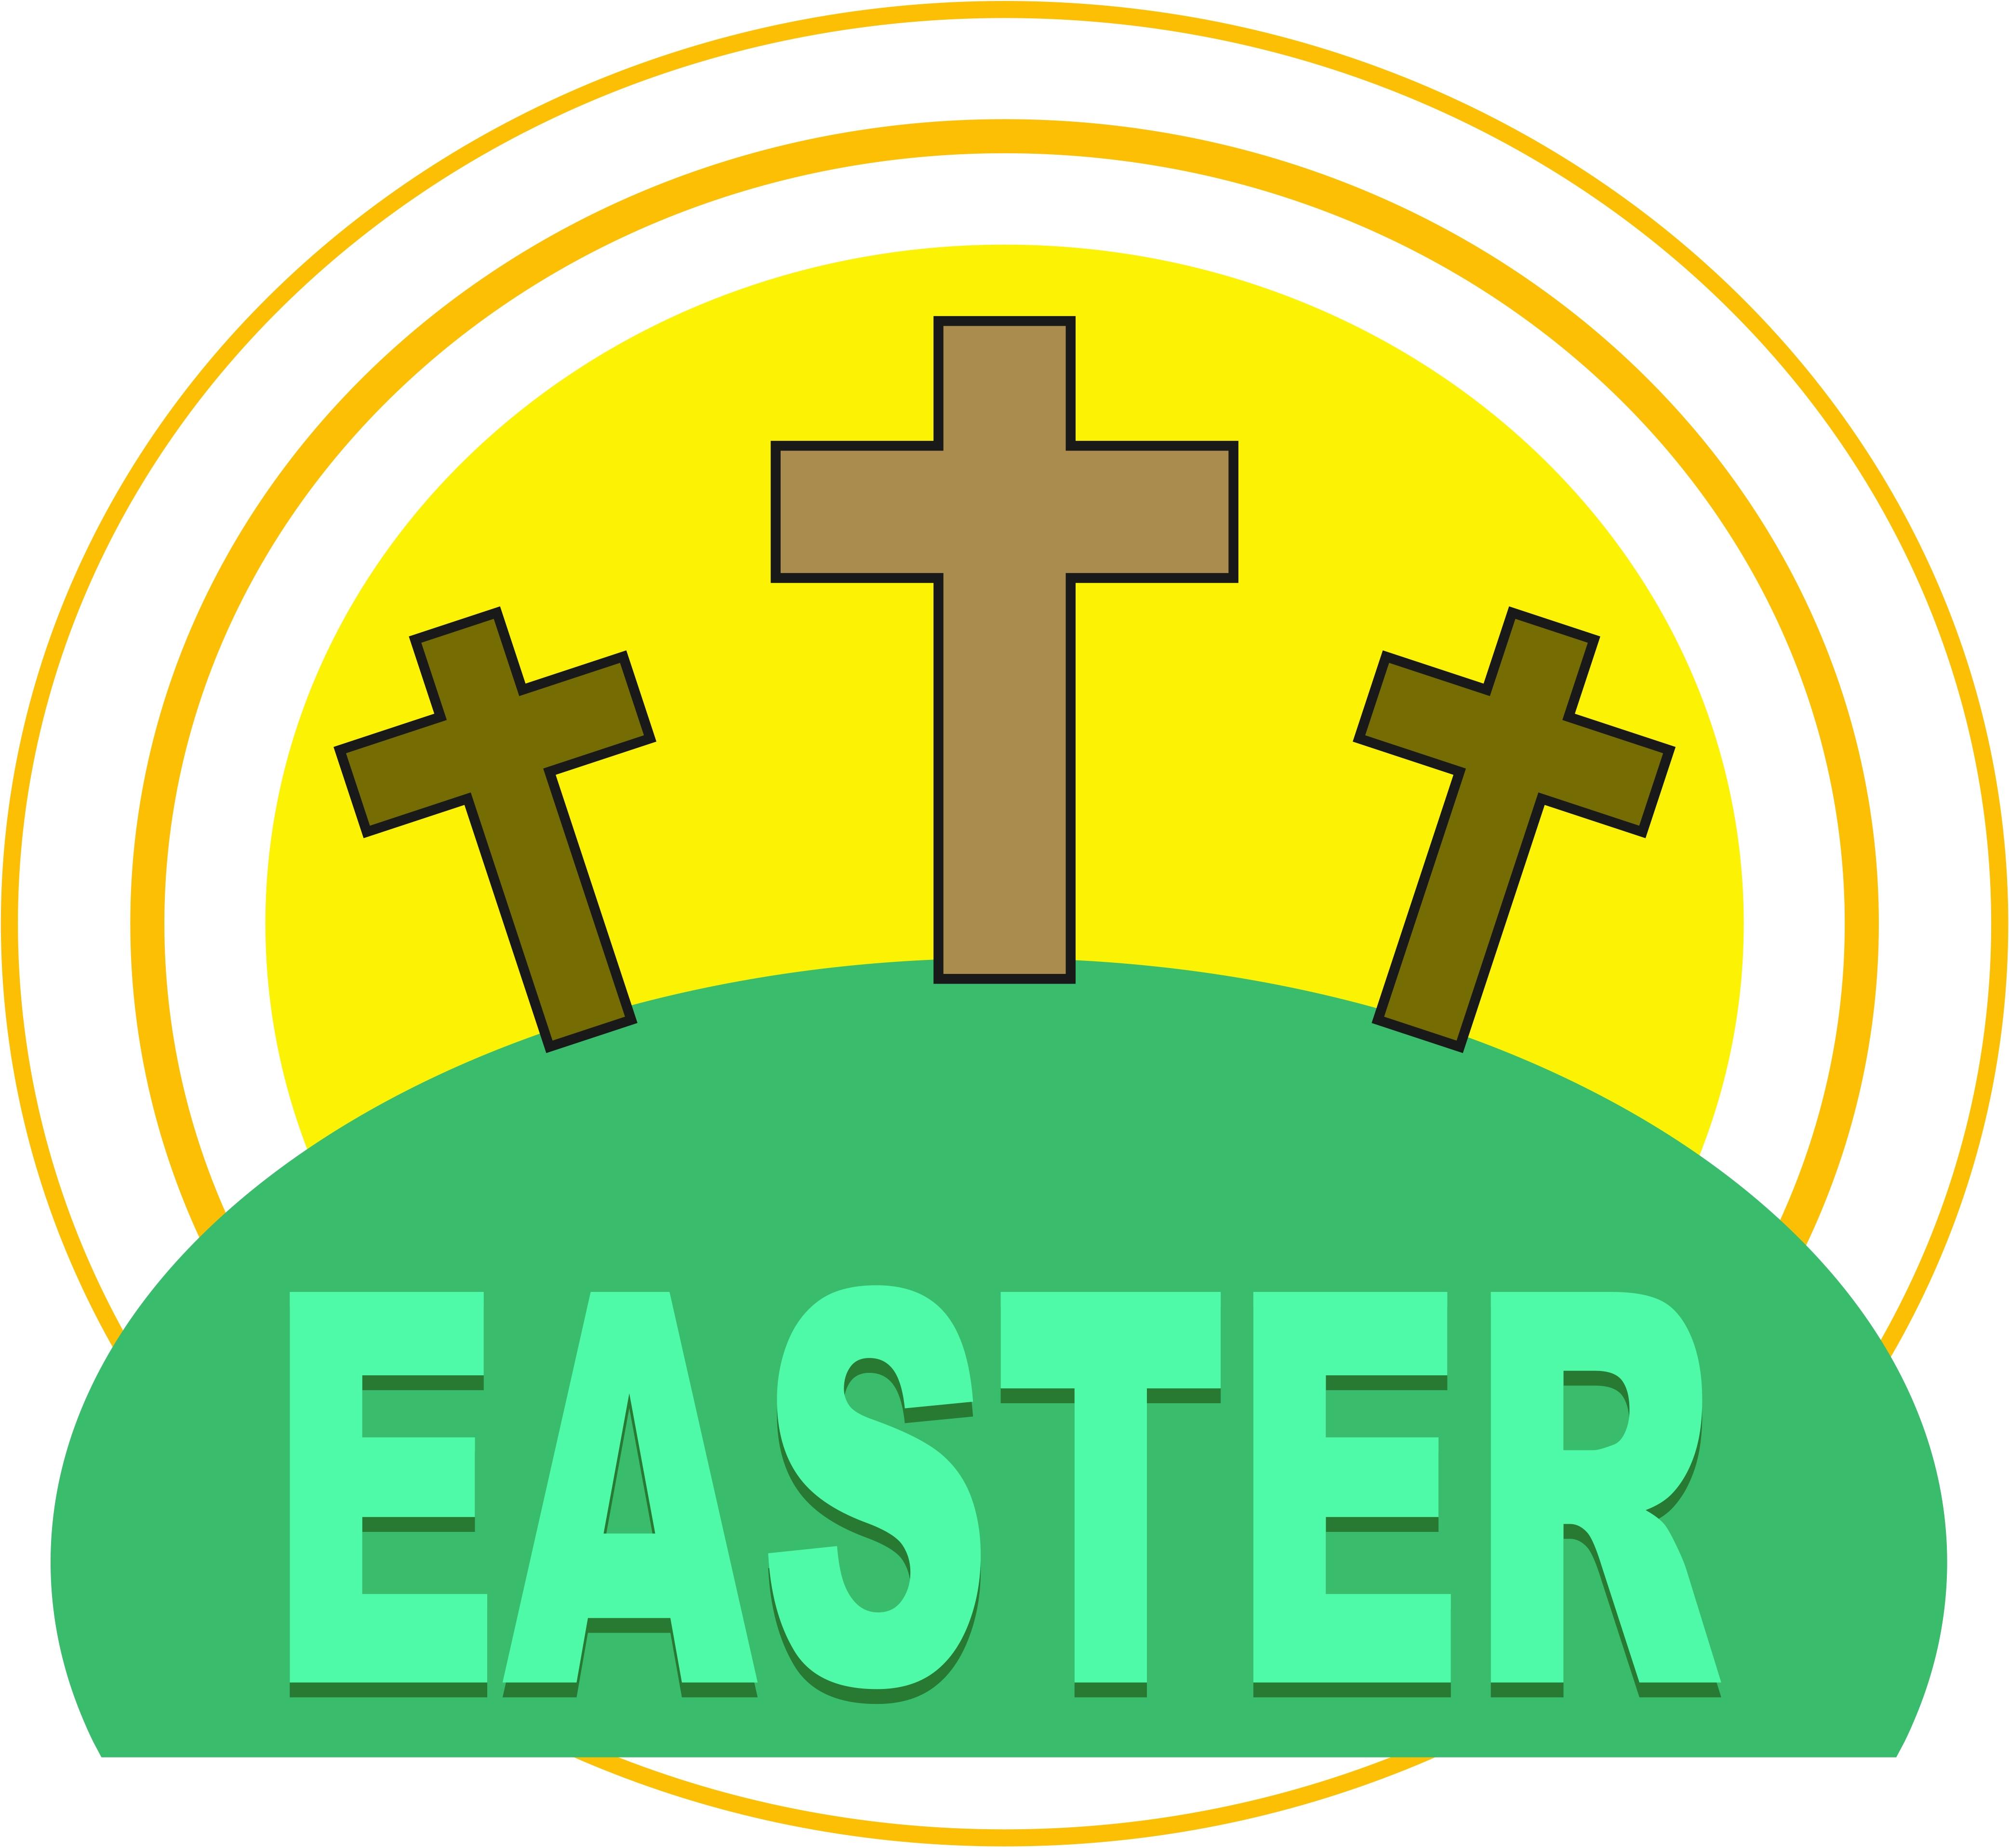 Christ Is Risen Clipart - Design Templates